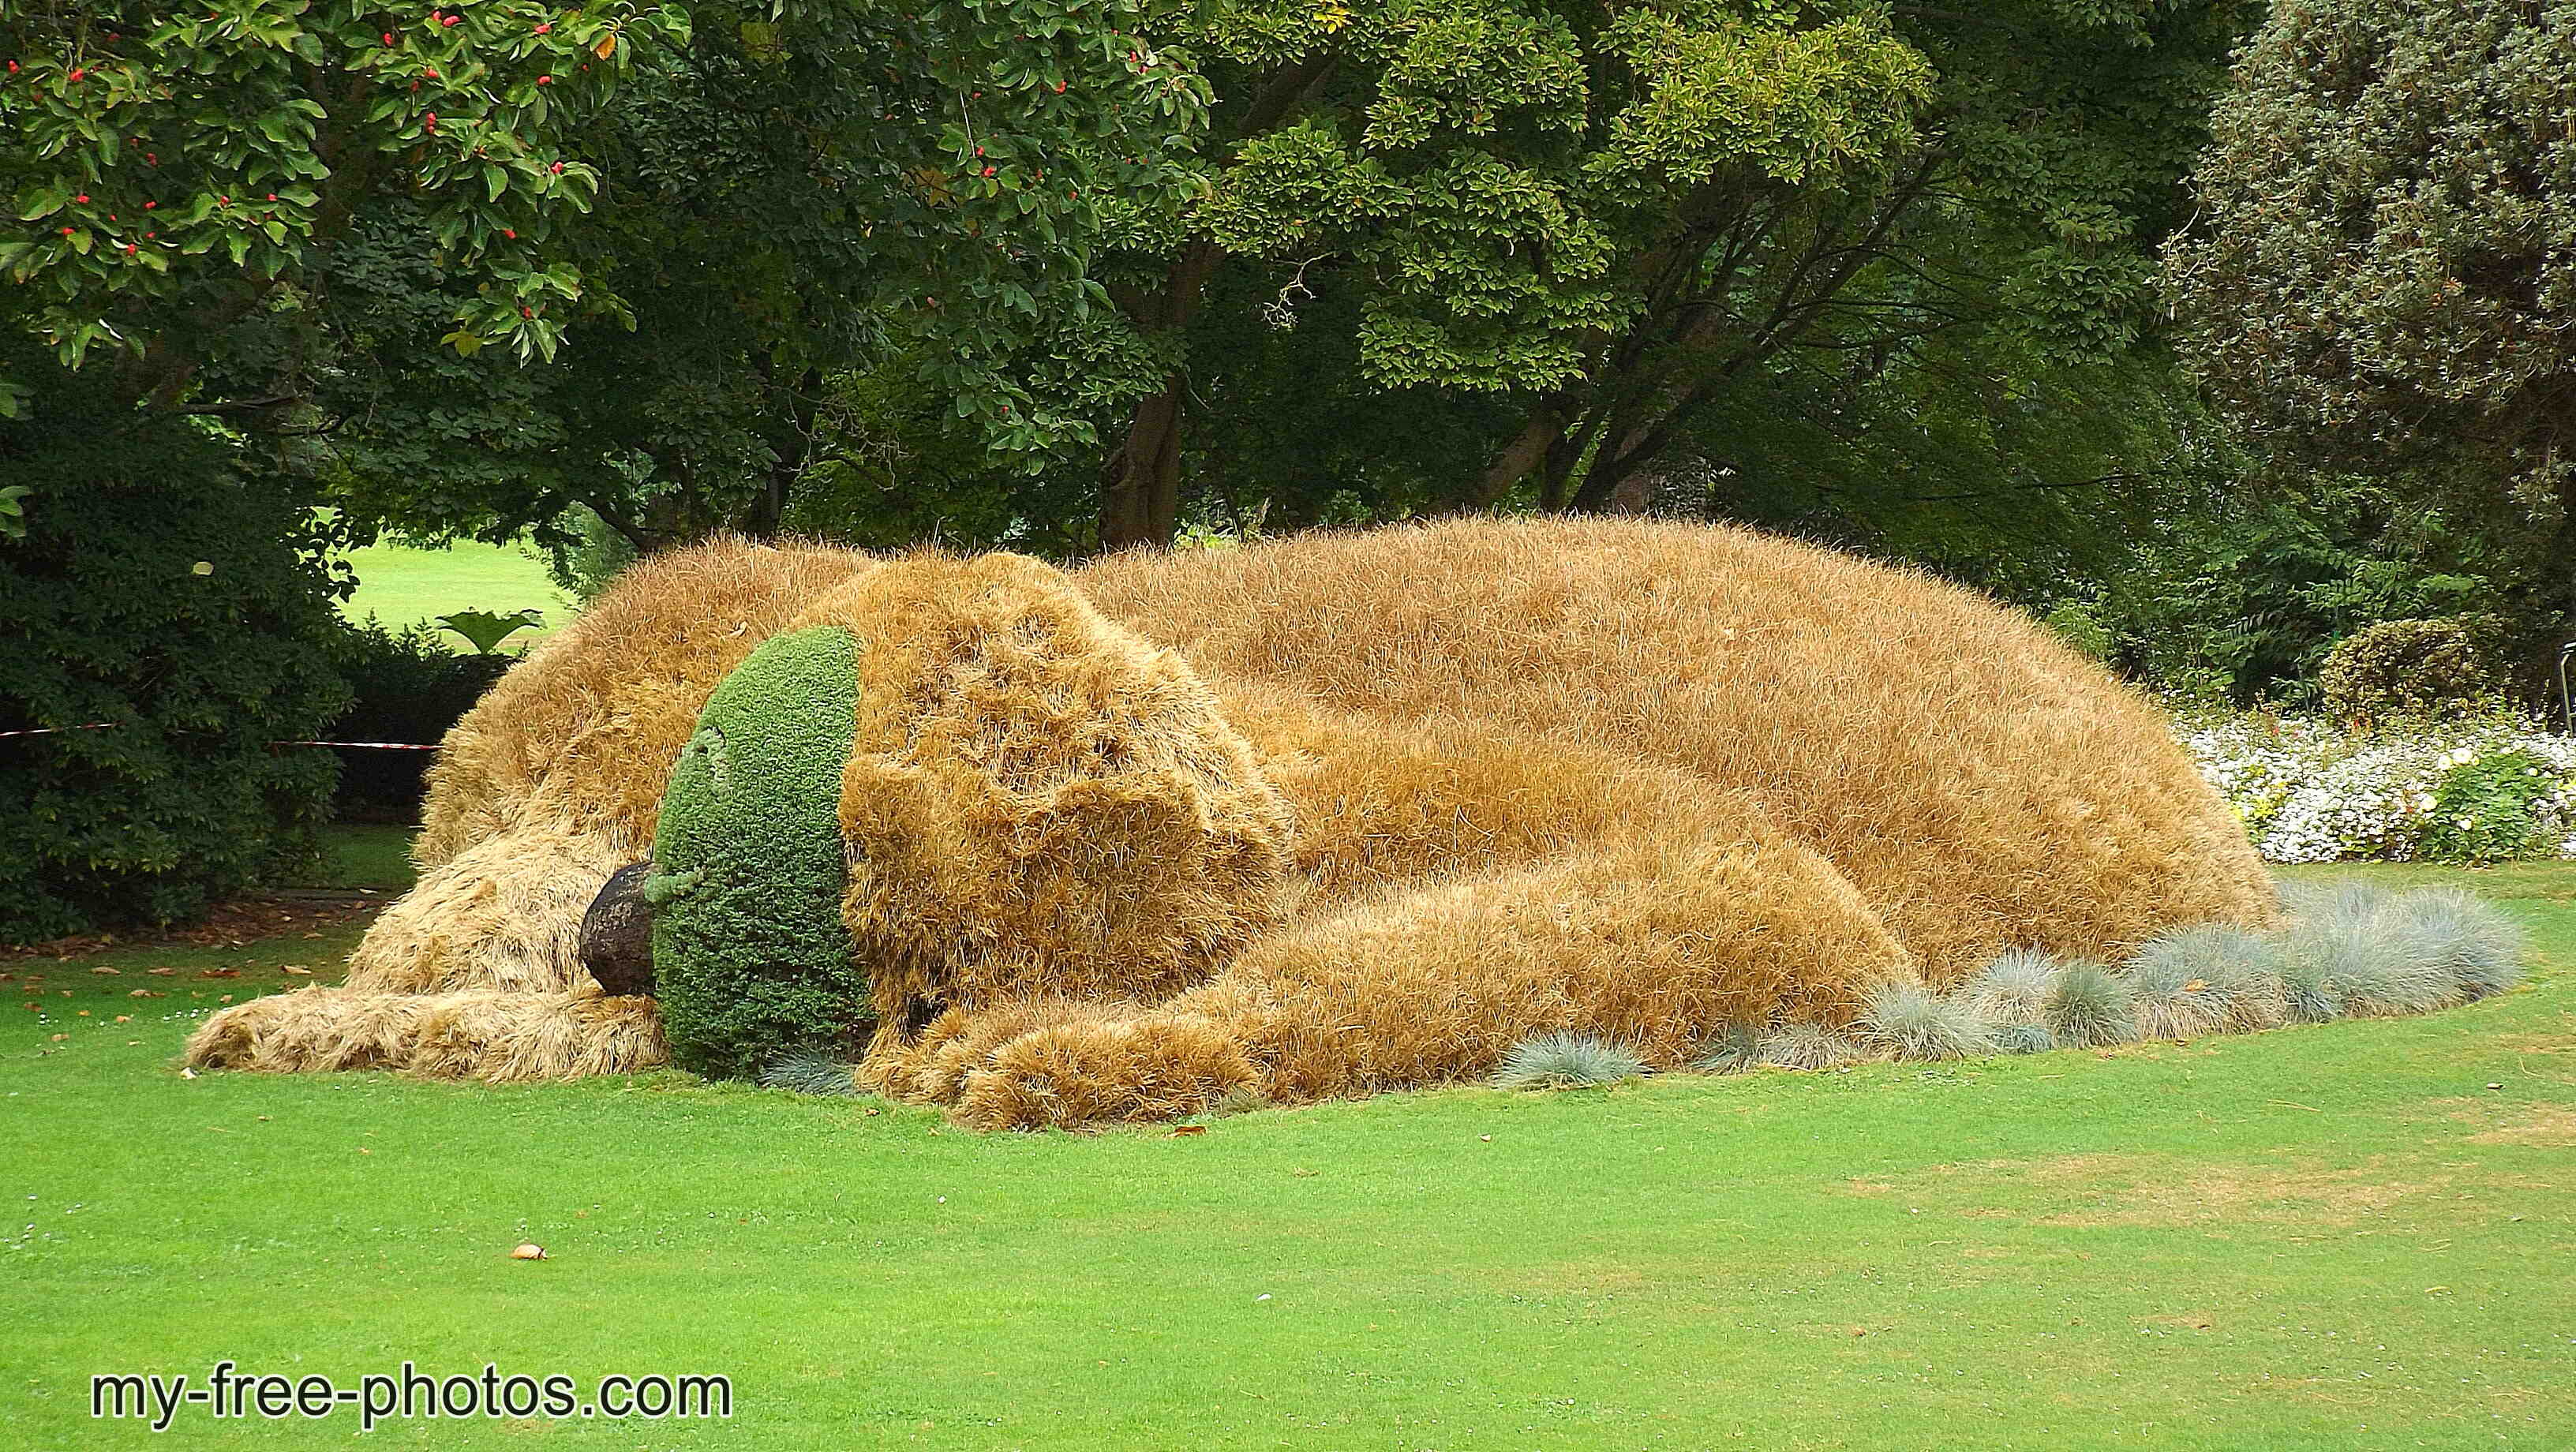 Jardin des Plantes, Nantes, France. Pic BRT1058.jpeg